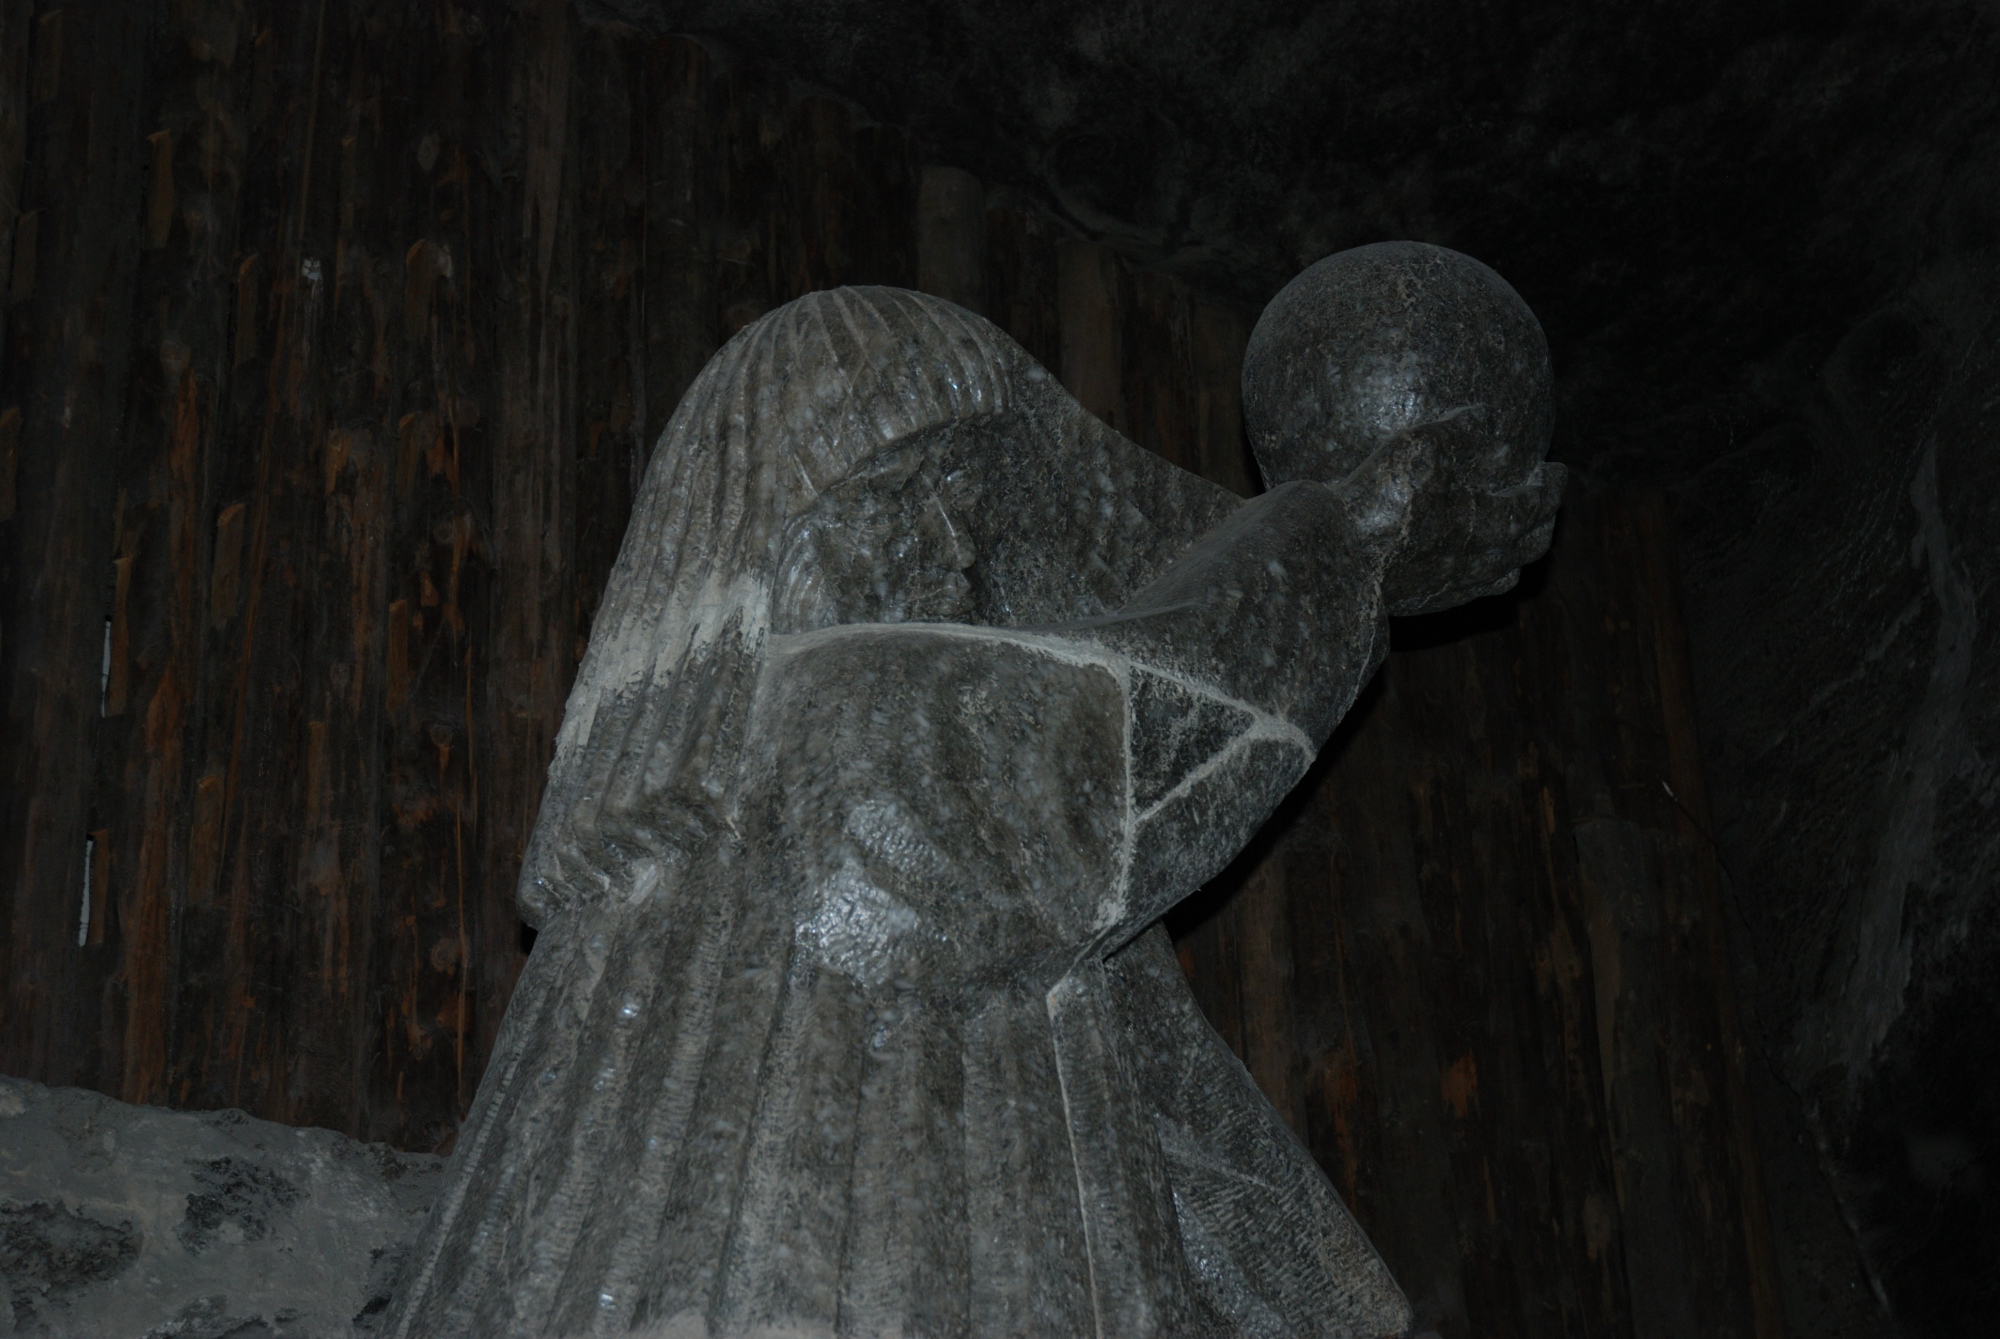 Minas de sal de Wieliczka. Estatuas de sal